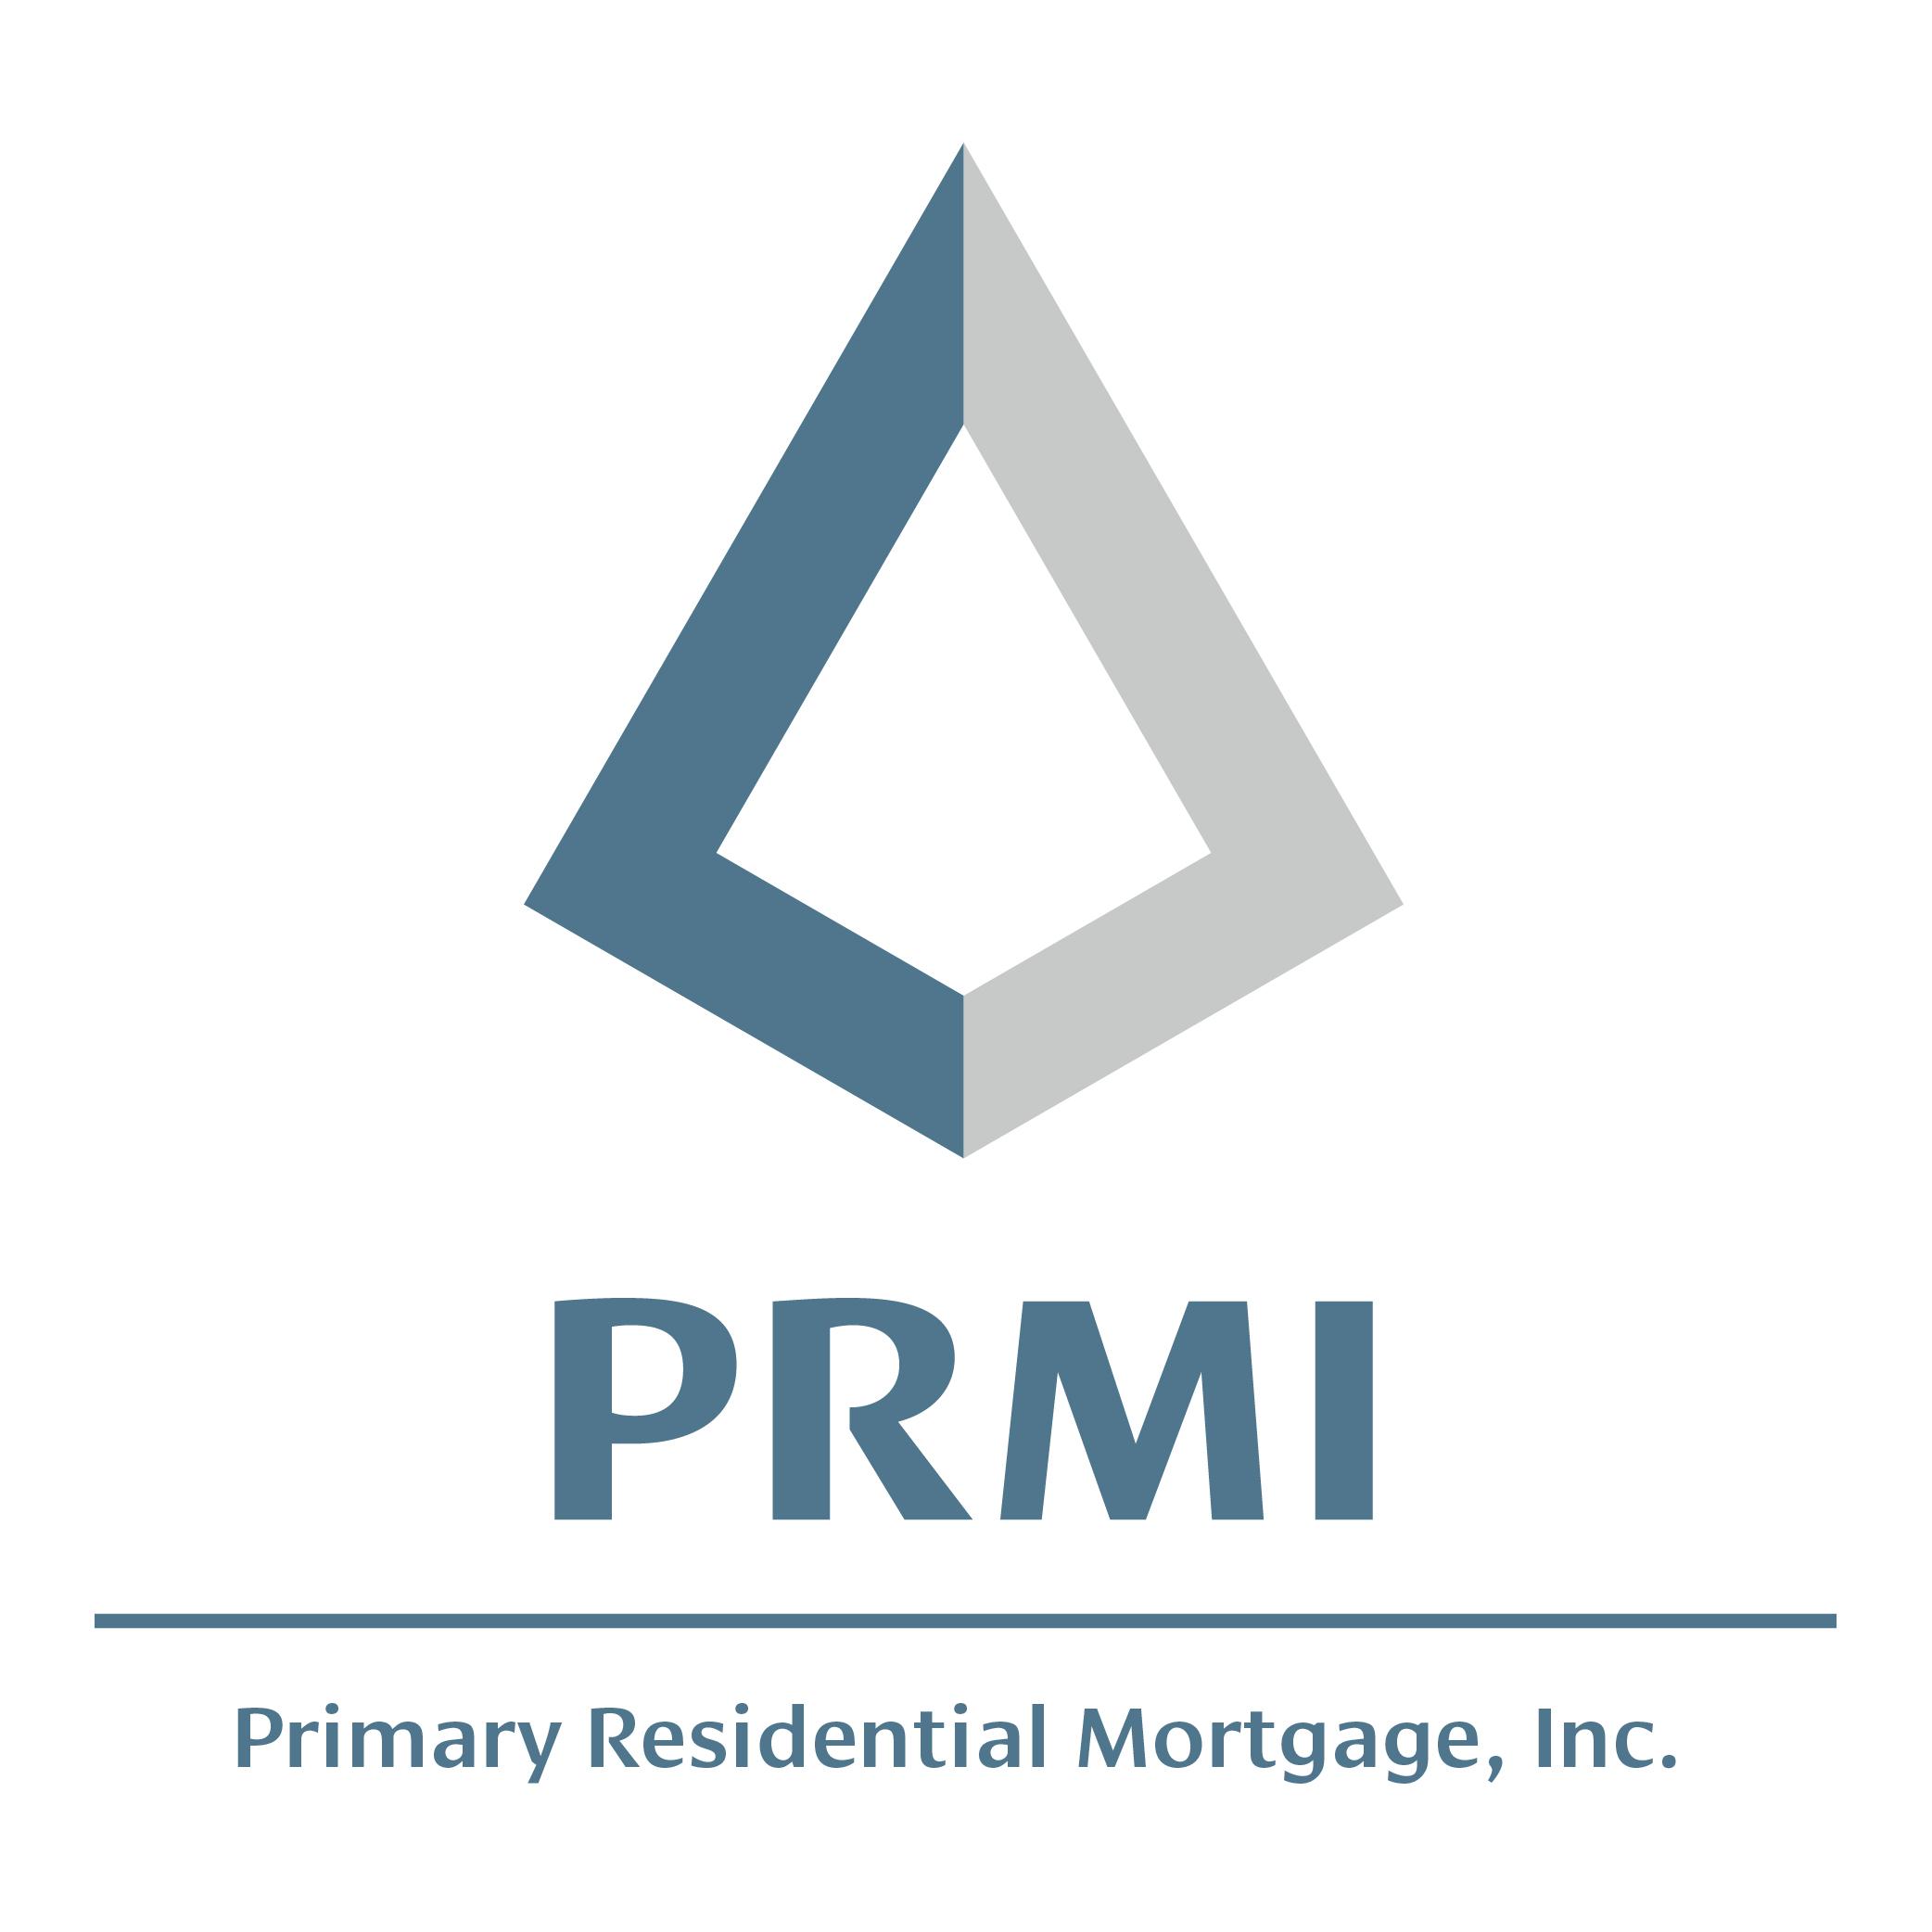 Primary Residential Mortgage, Inc. - Washington Terrace, UT 84405 - (801)475-7557   ShowMeLocal.com